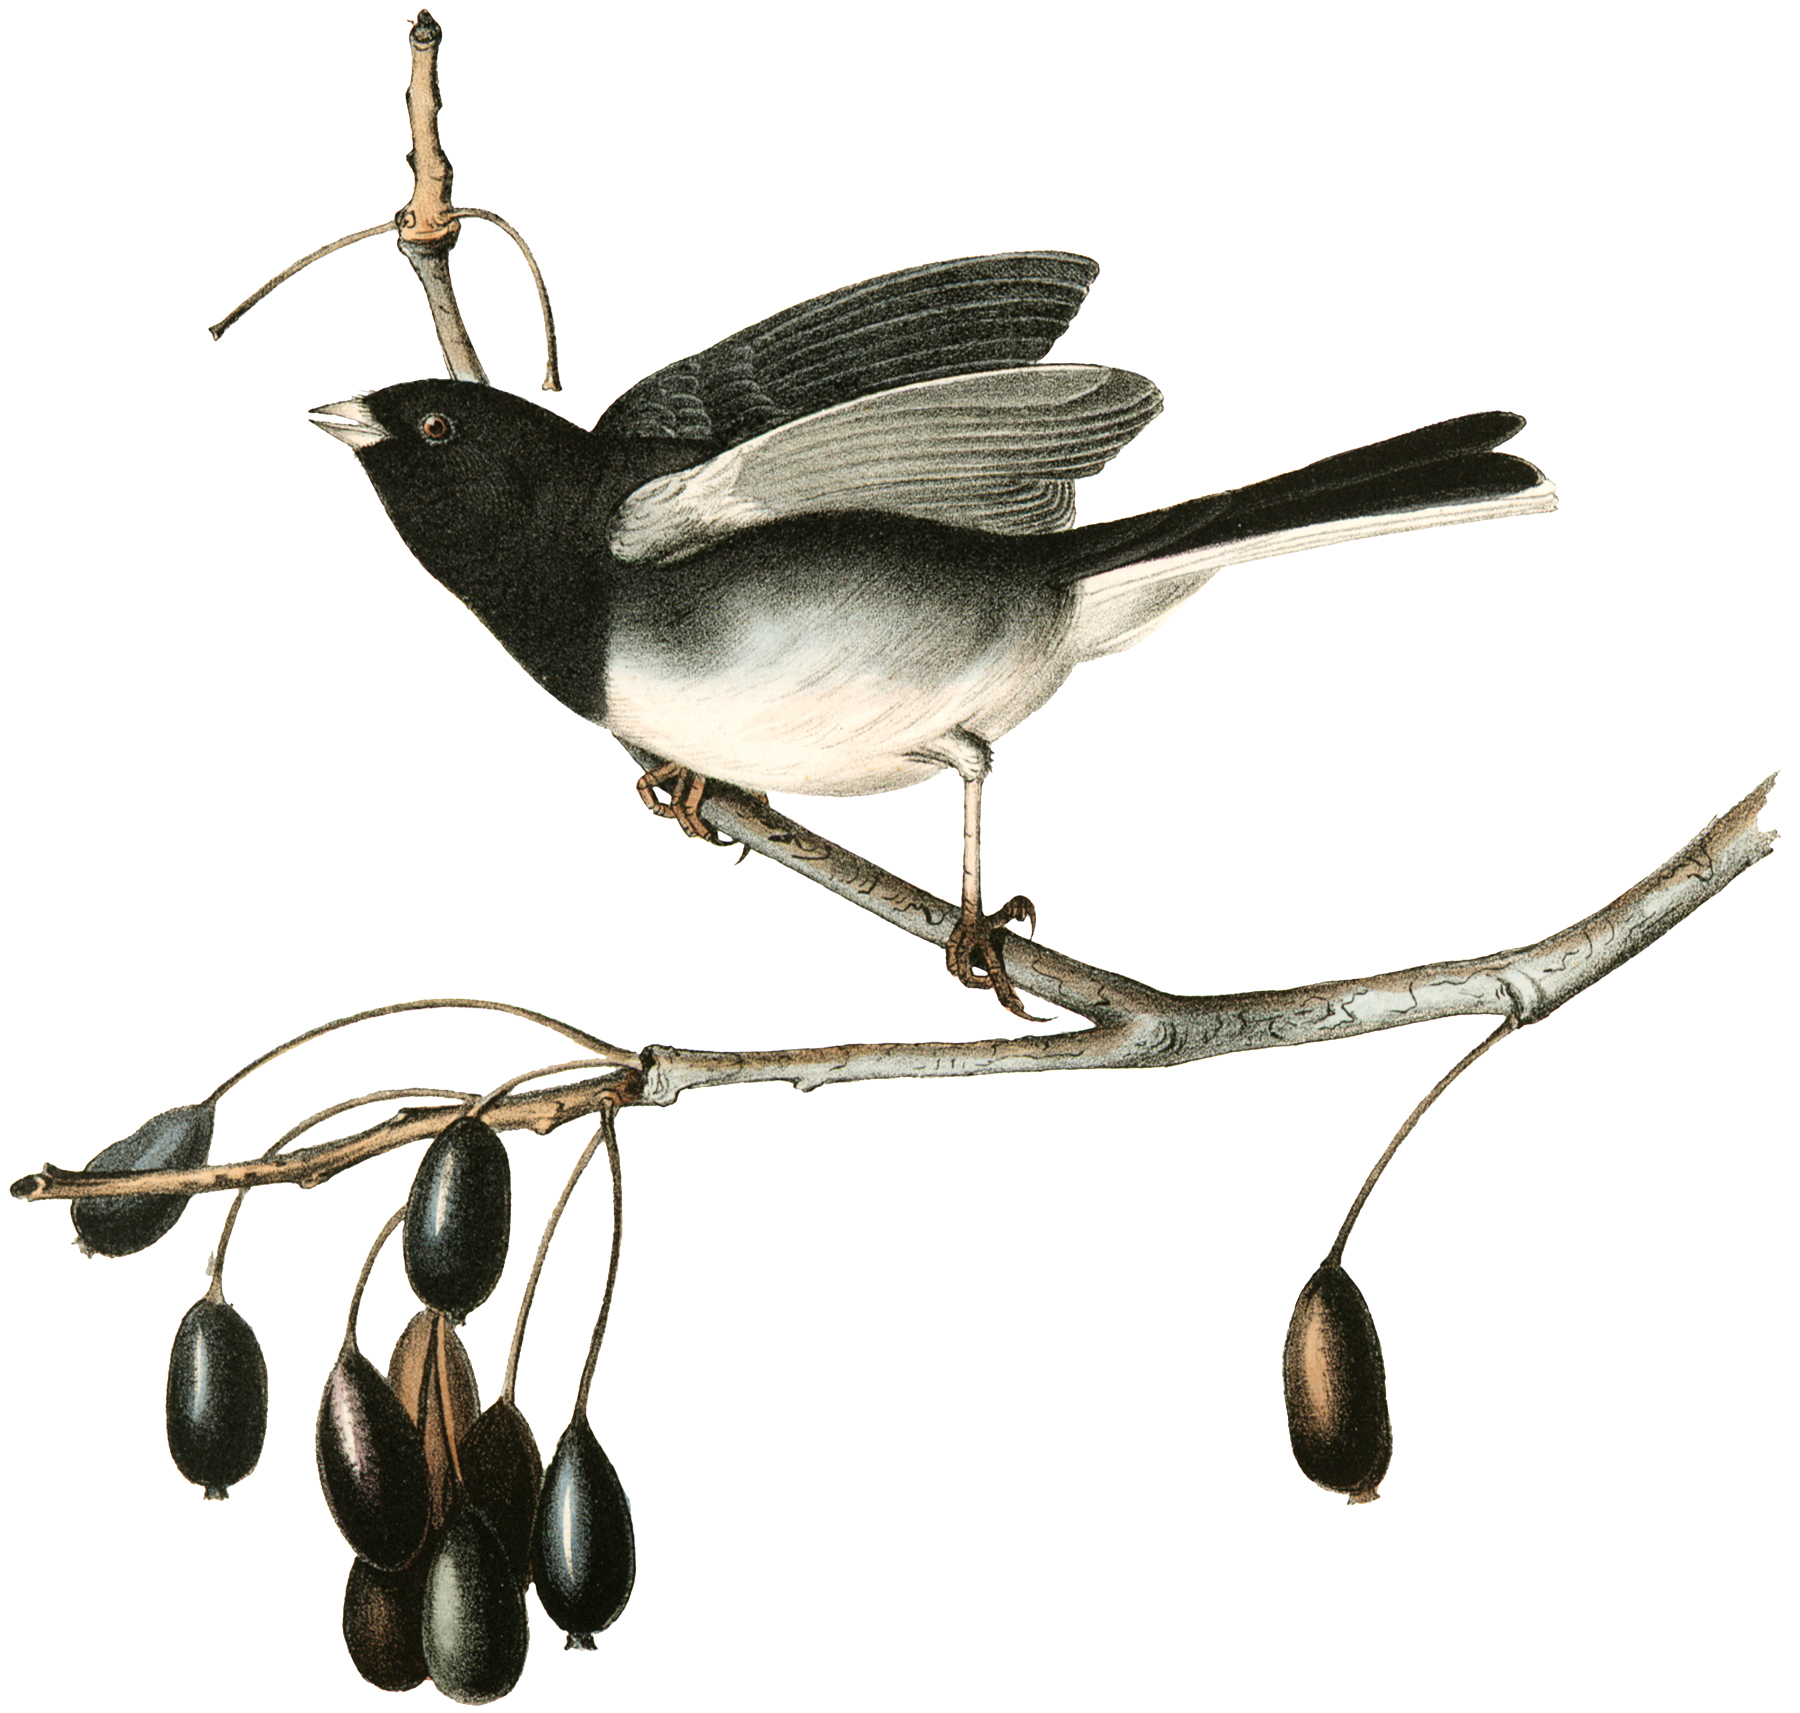 Vintage Bird with Berries Image